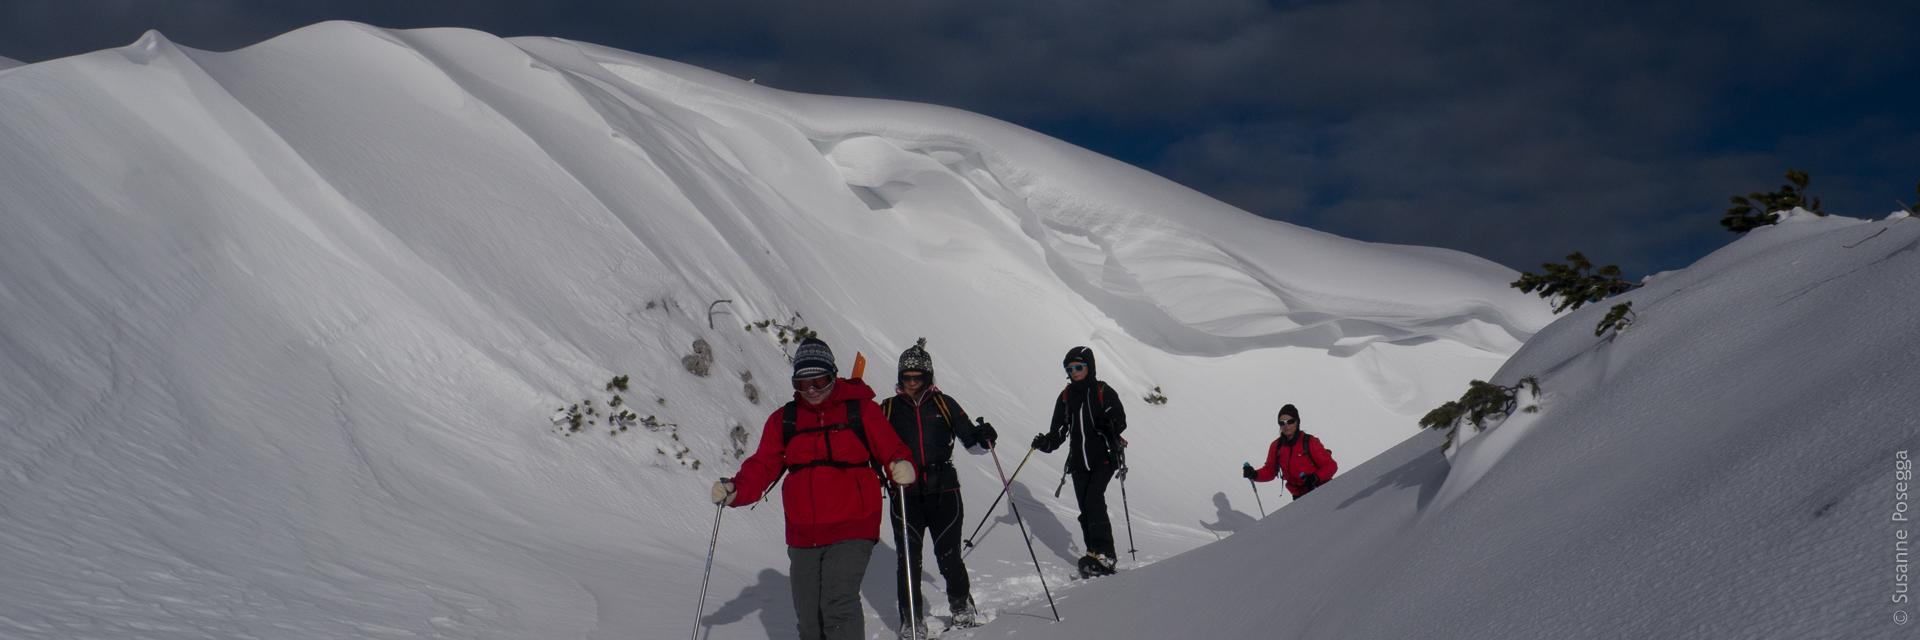 Schneeschuhwandern_©Susanne_Posegga__1400185